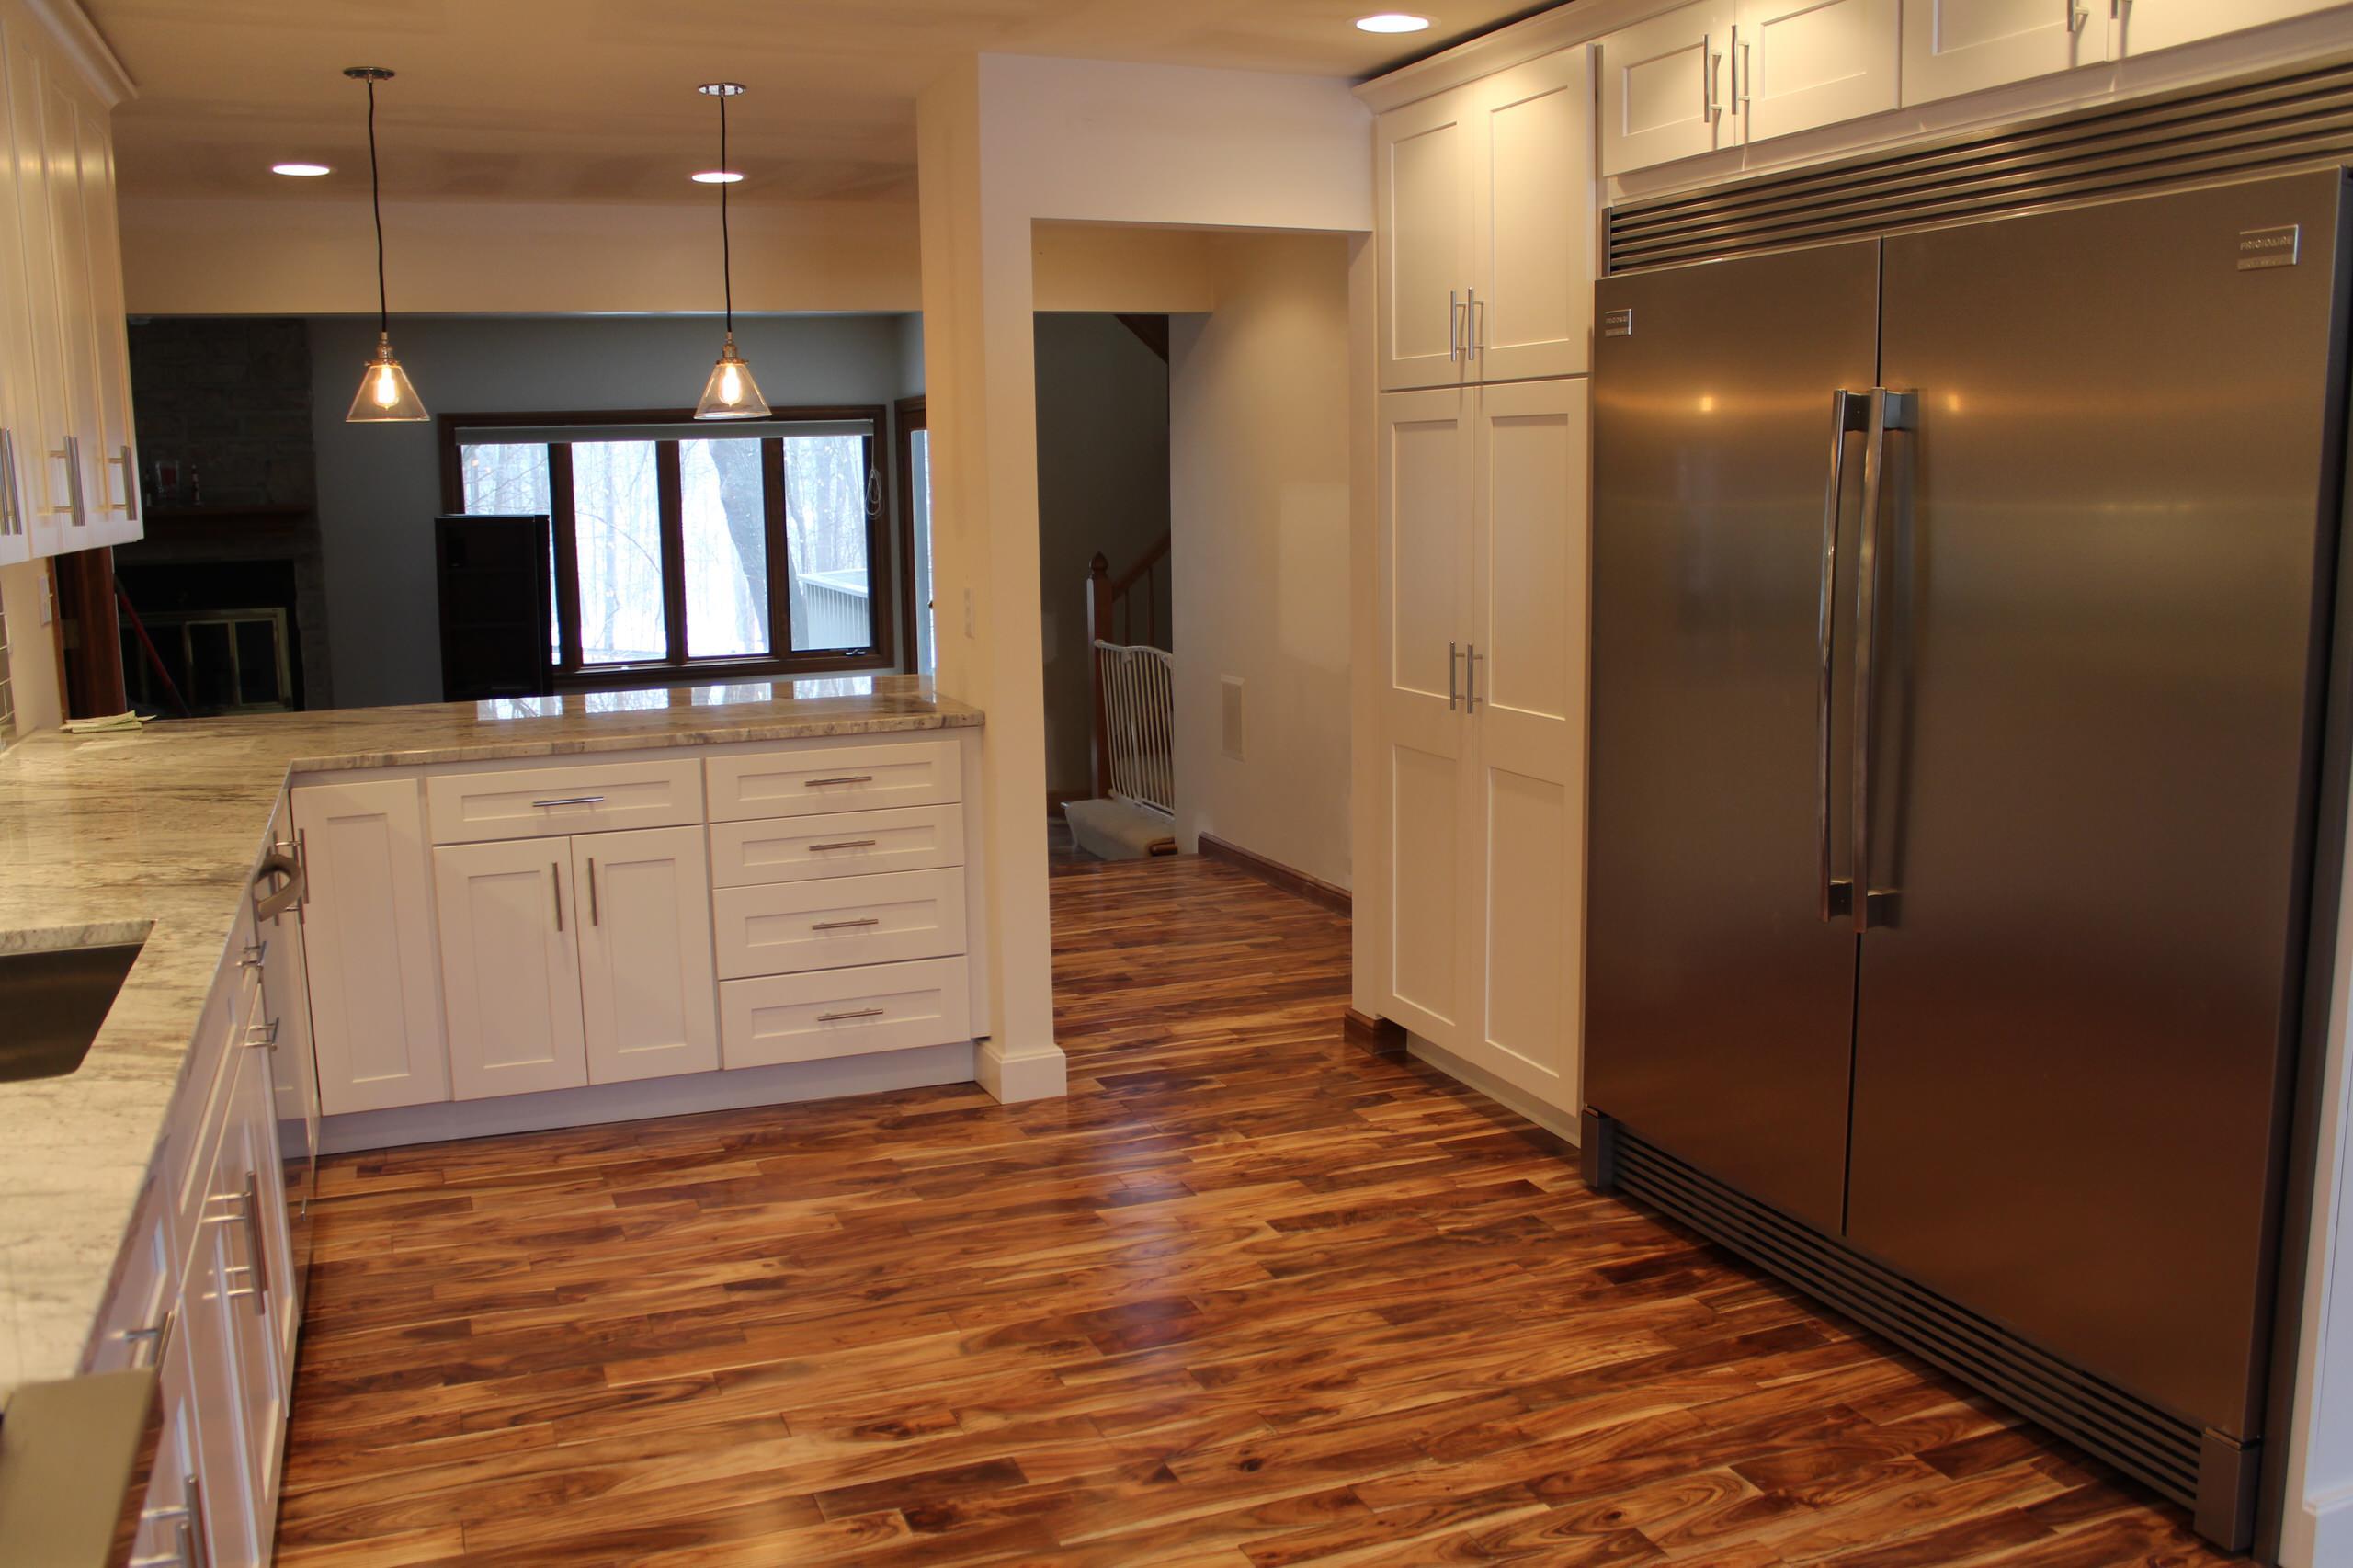 Dublin, Muirfield complete kitchen remodel